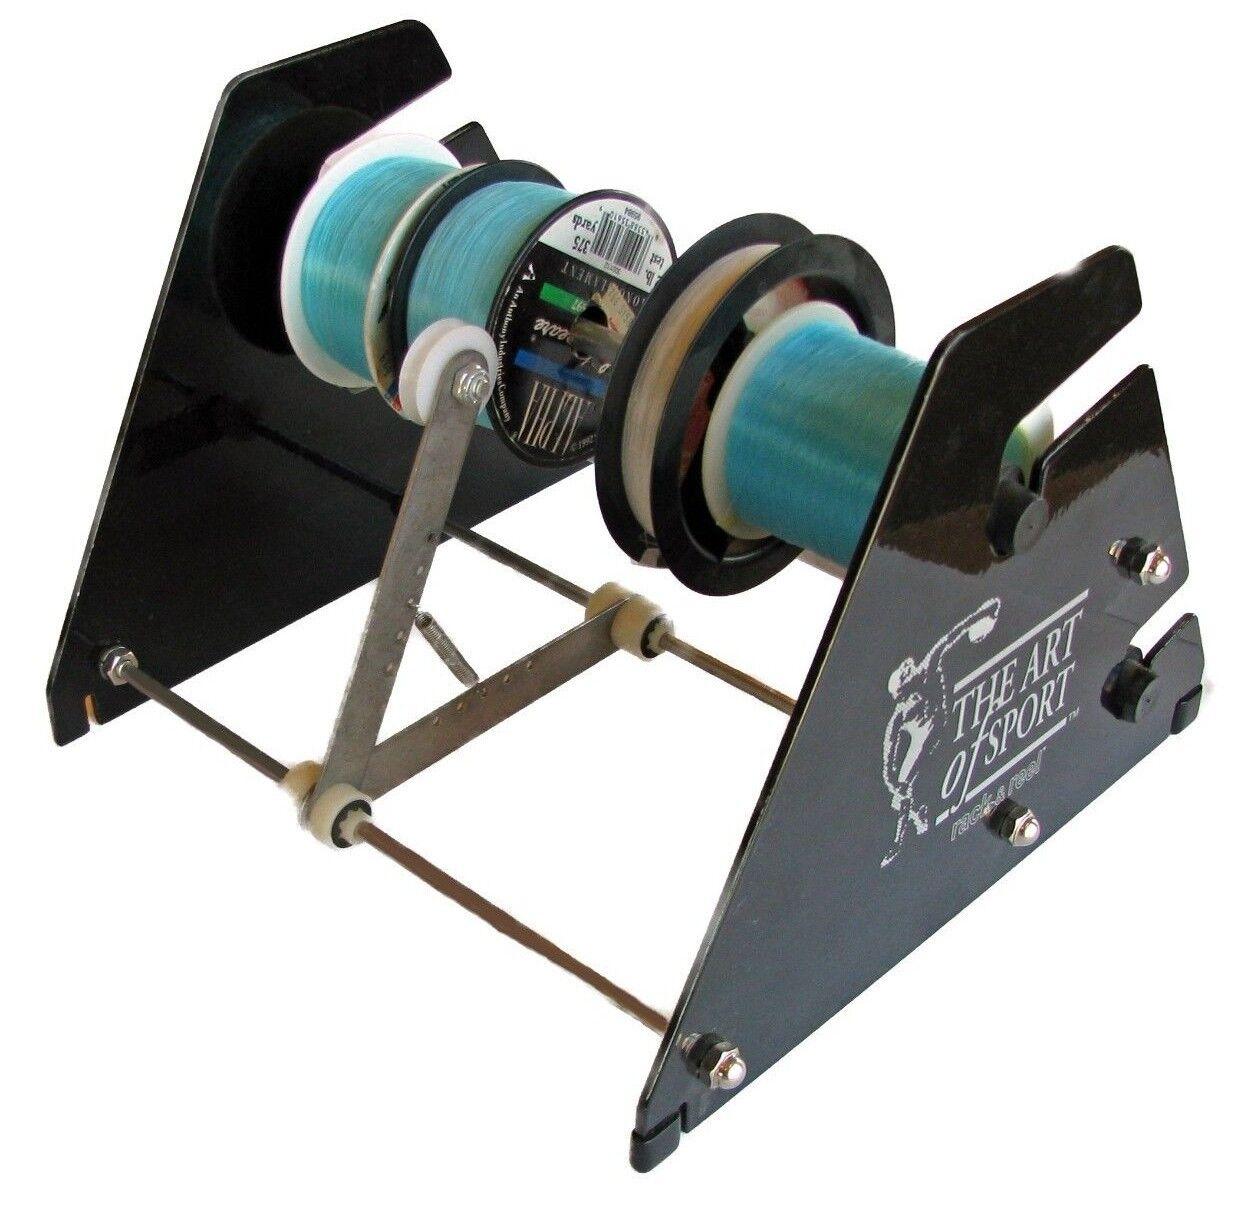 10 PC Rack and Reels fishing gear line spooler spool holder line winder